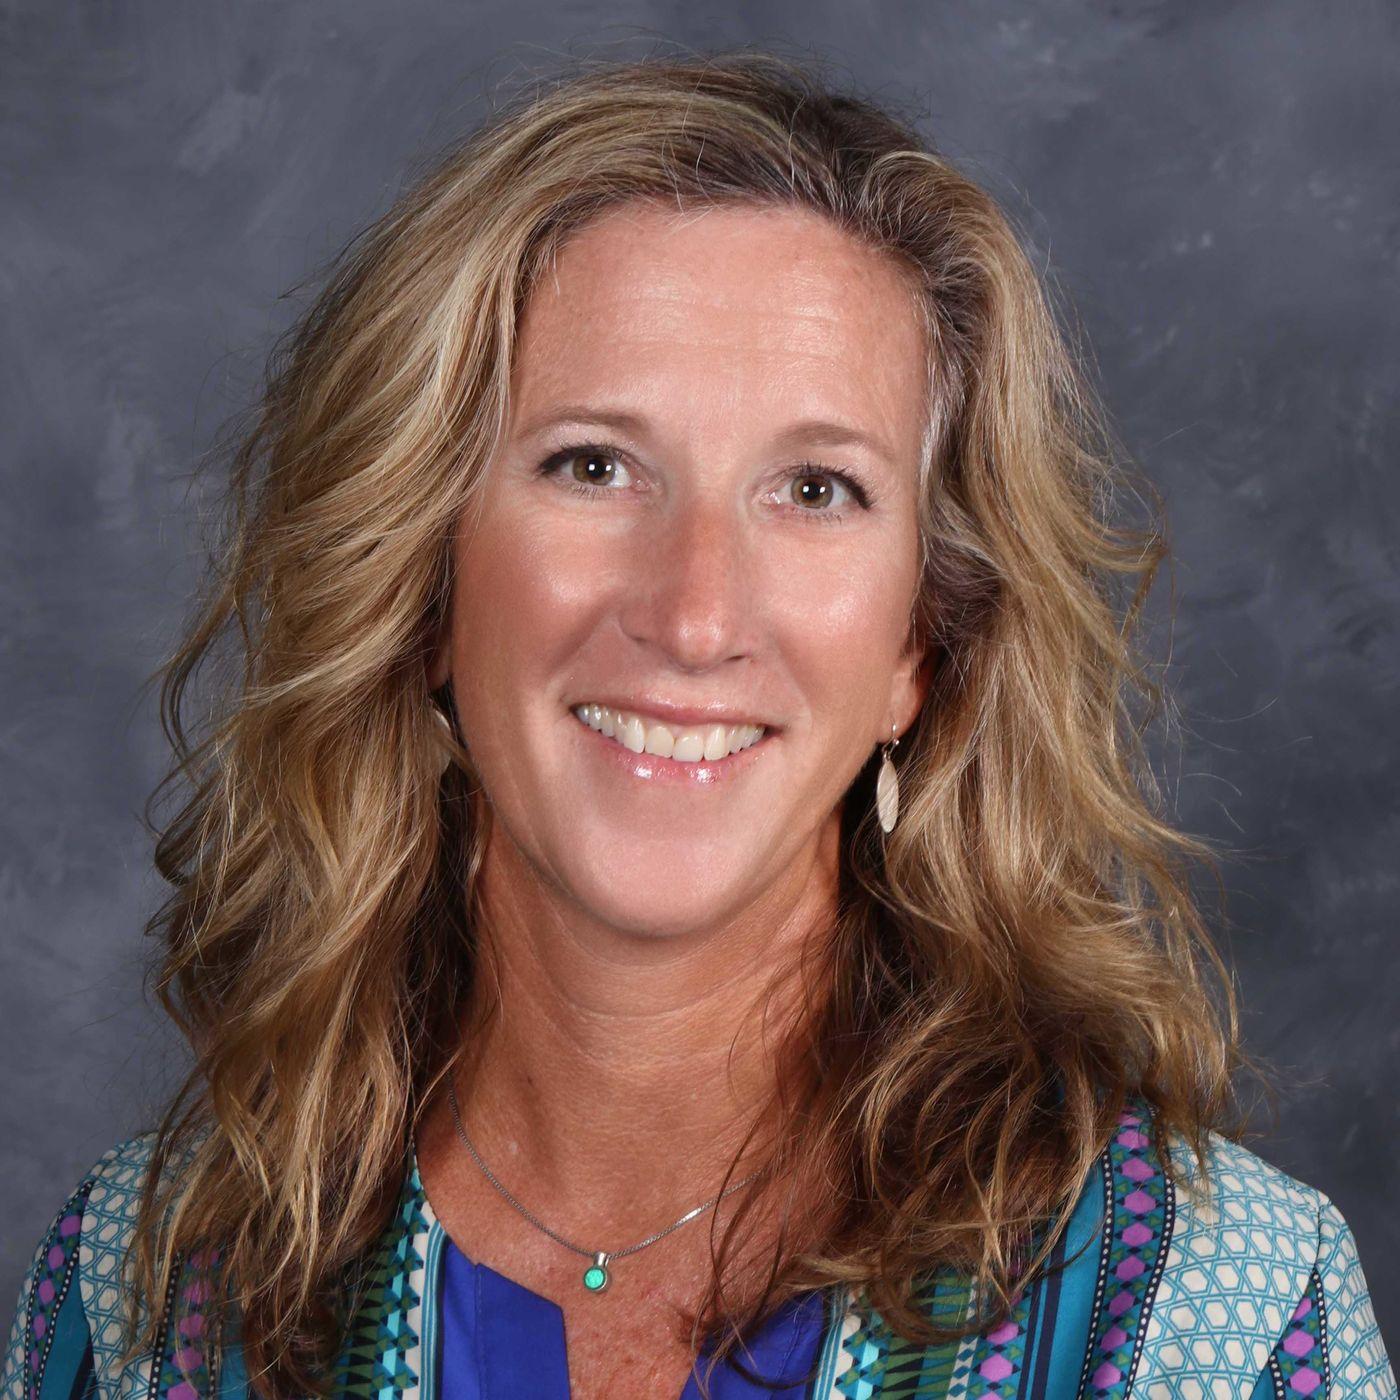 2018 Delaware Teacher of the Year: Jinni Forcucci